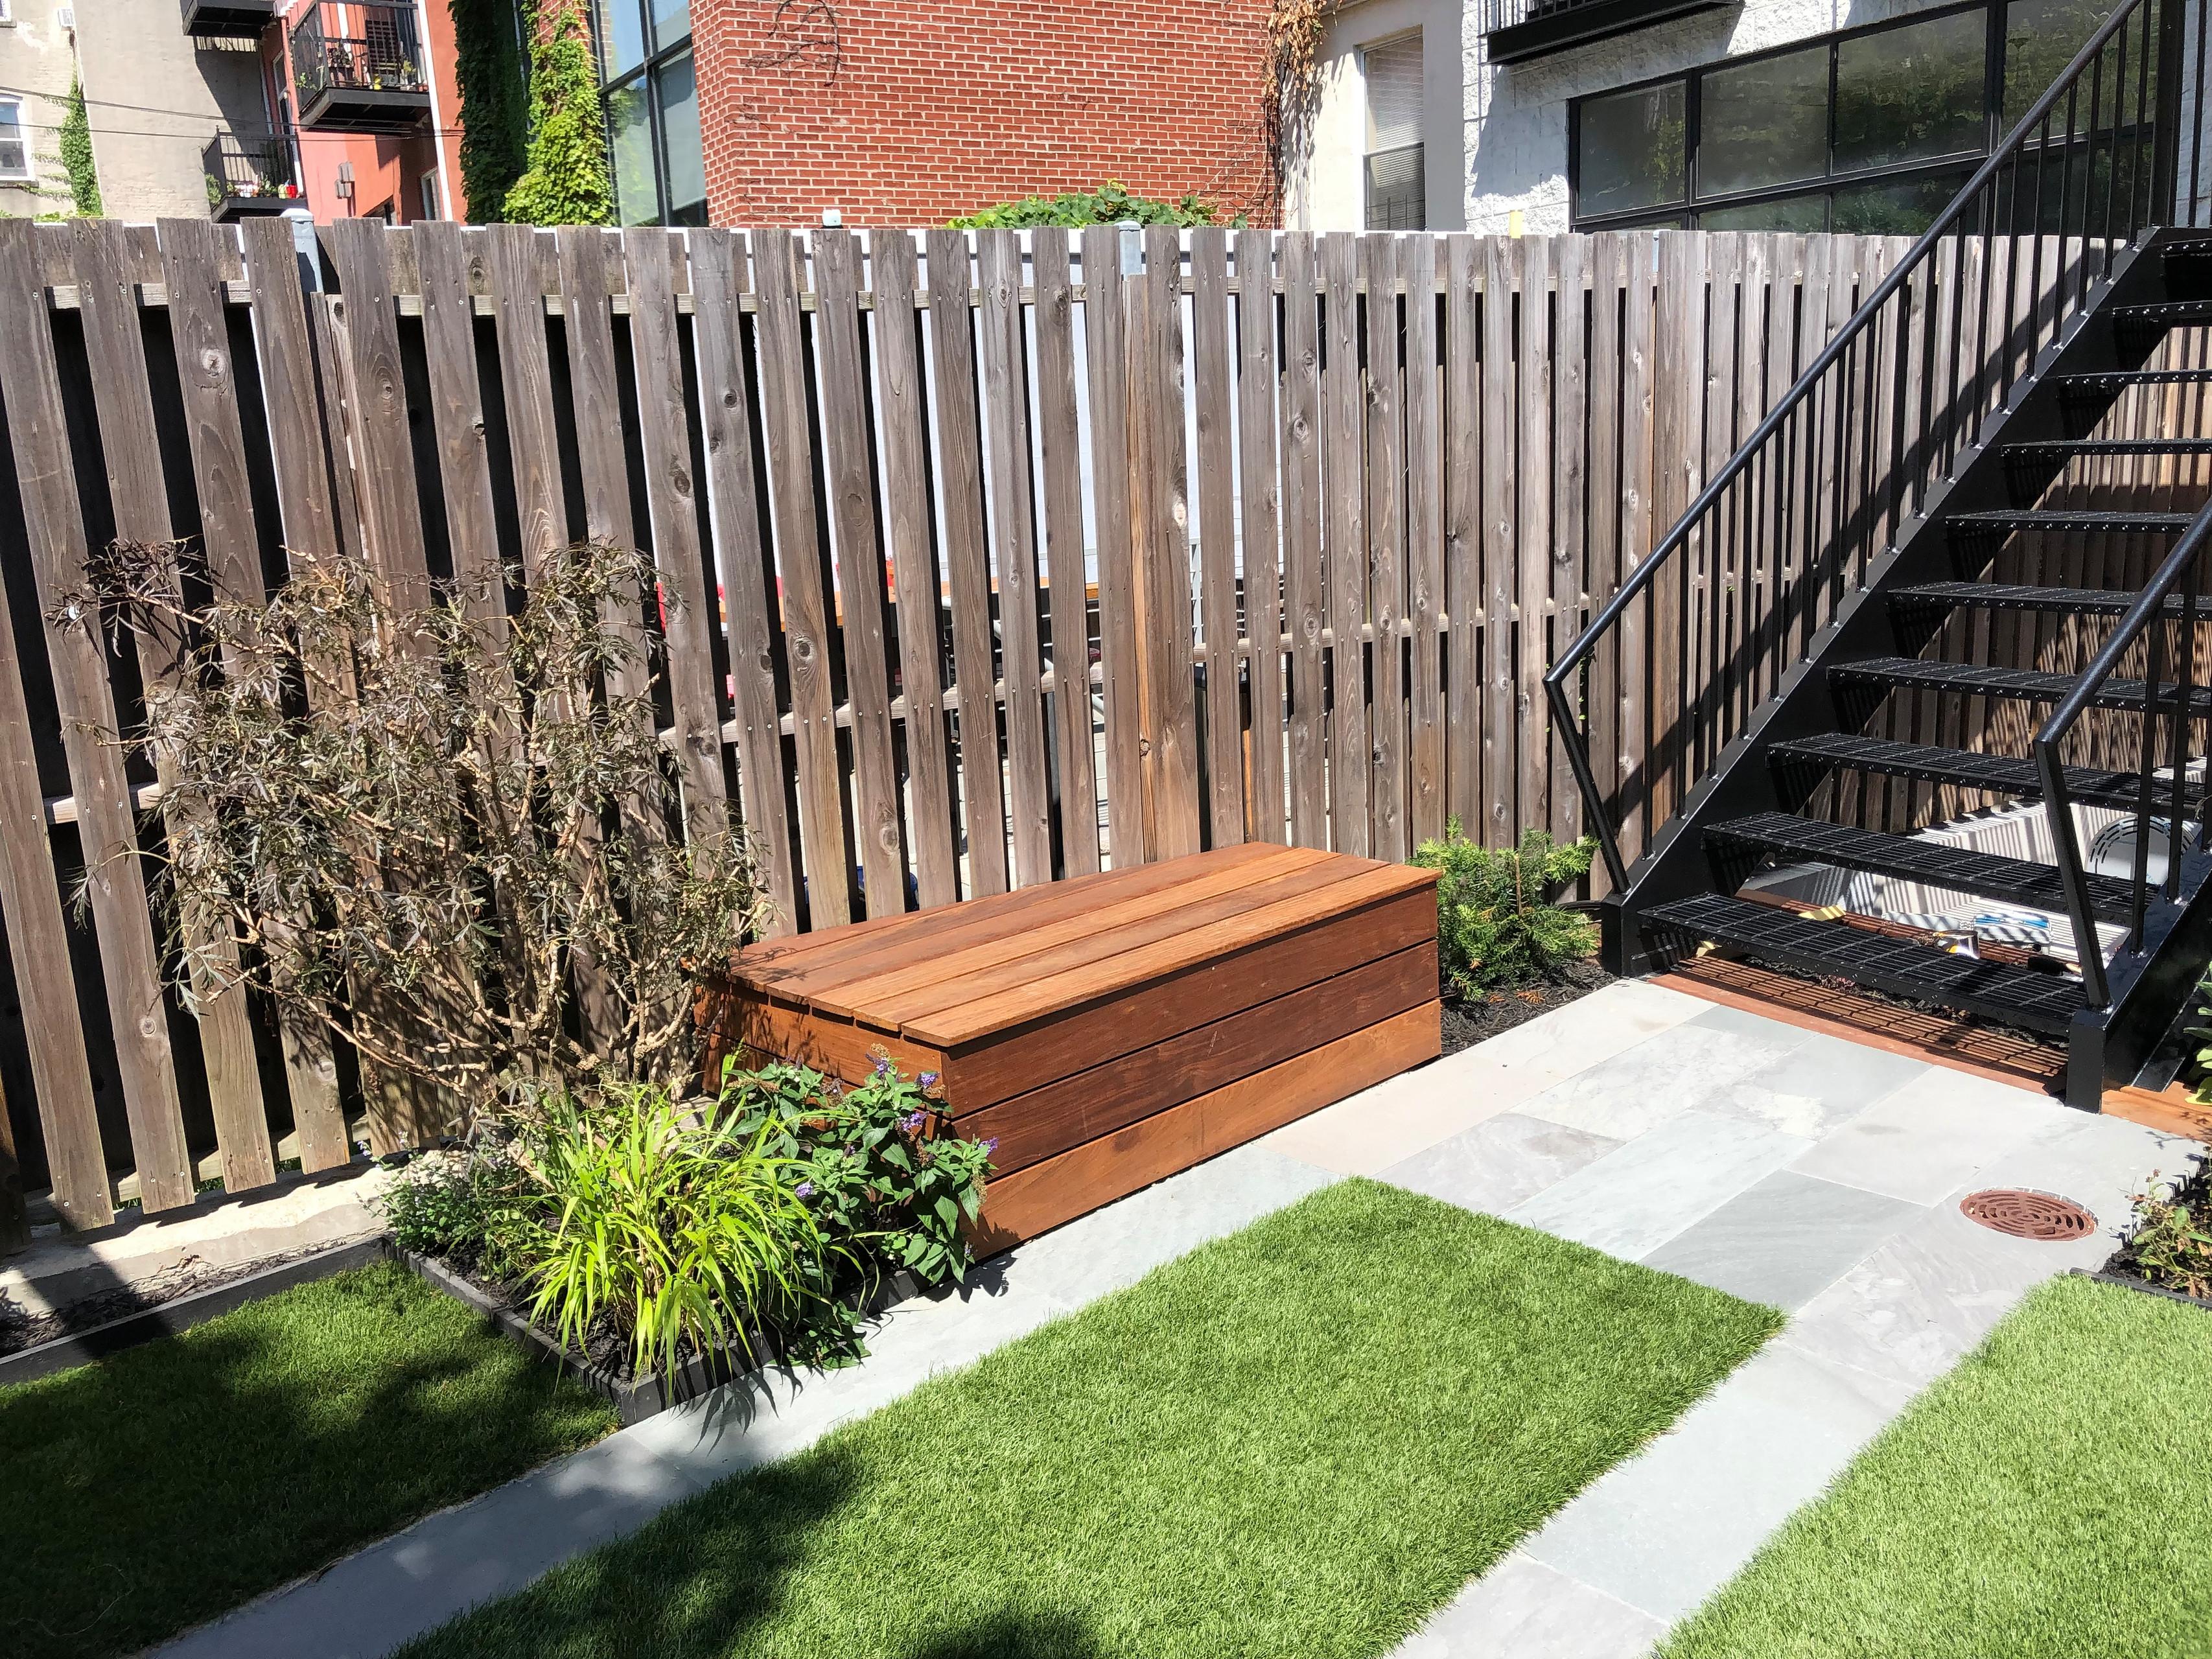 Brooklyn backyard with small playground